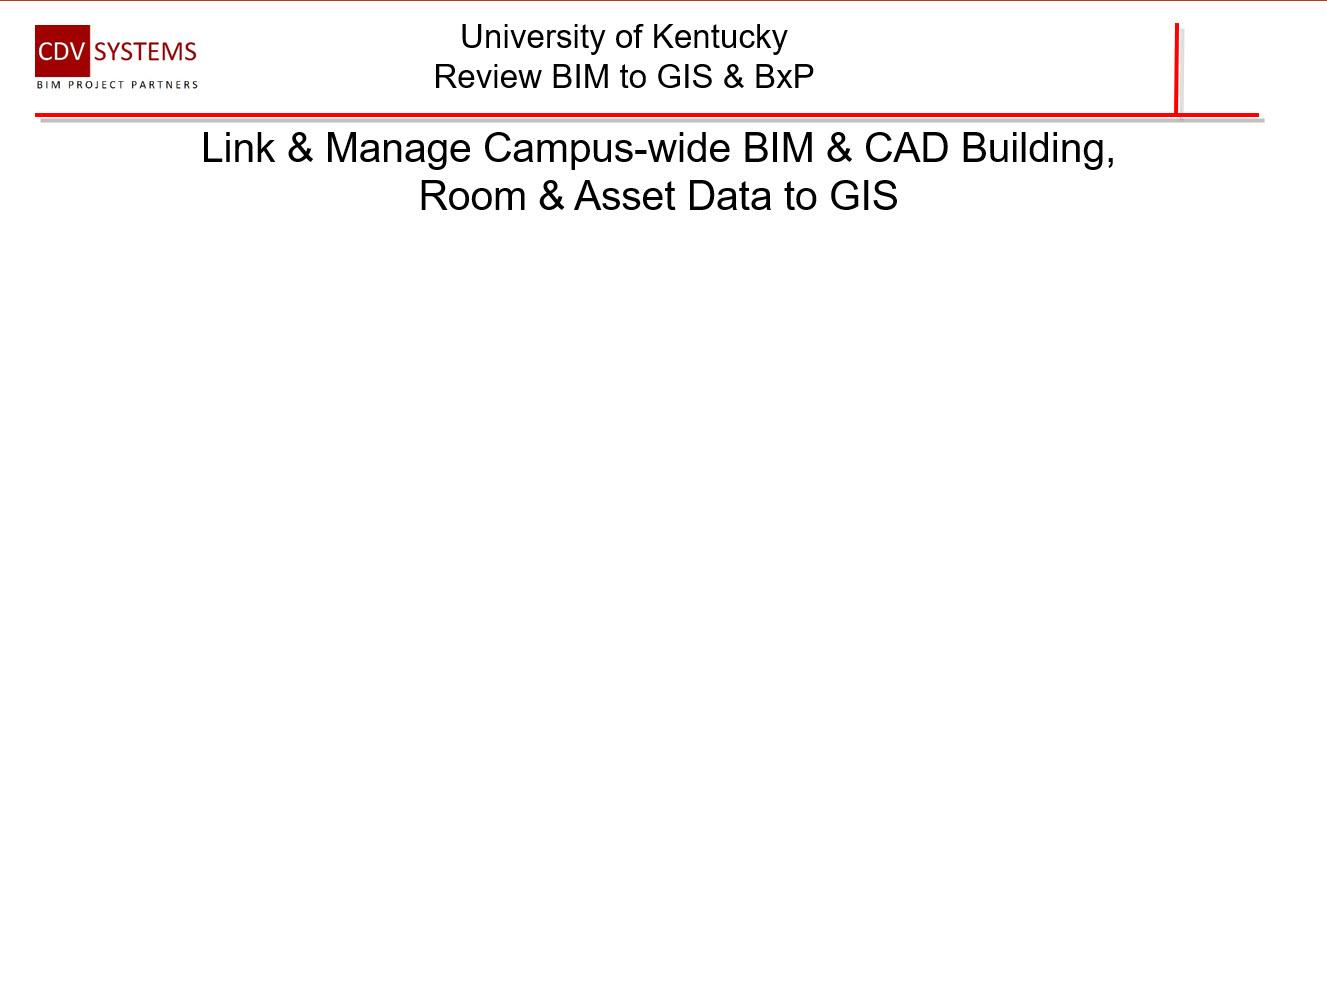 University of Kentucky_005.jpg